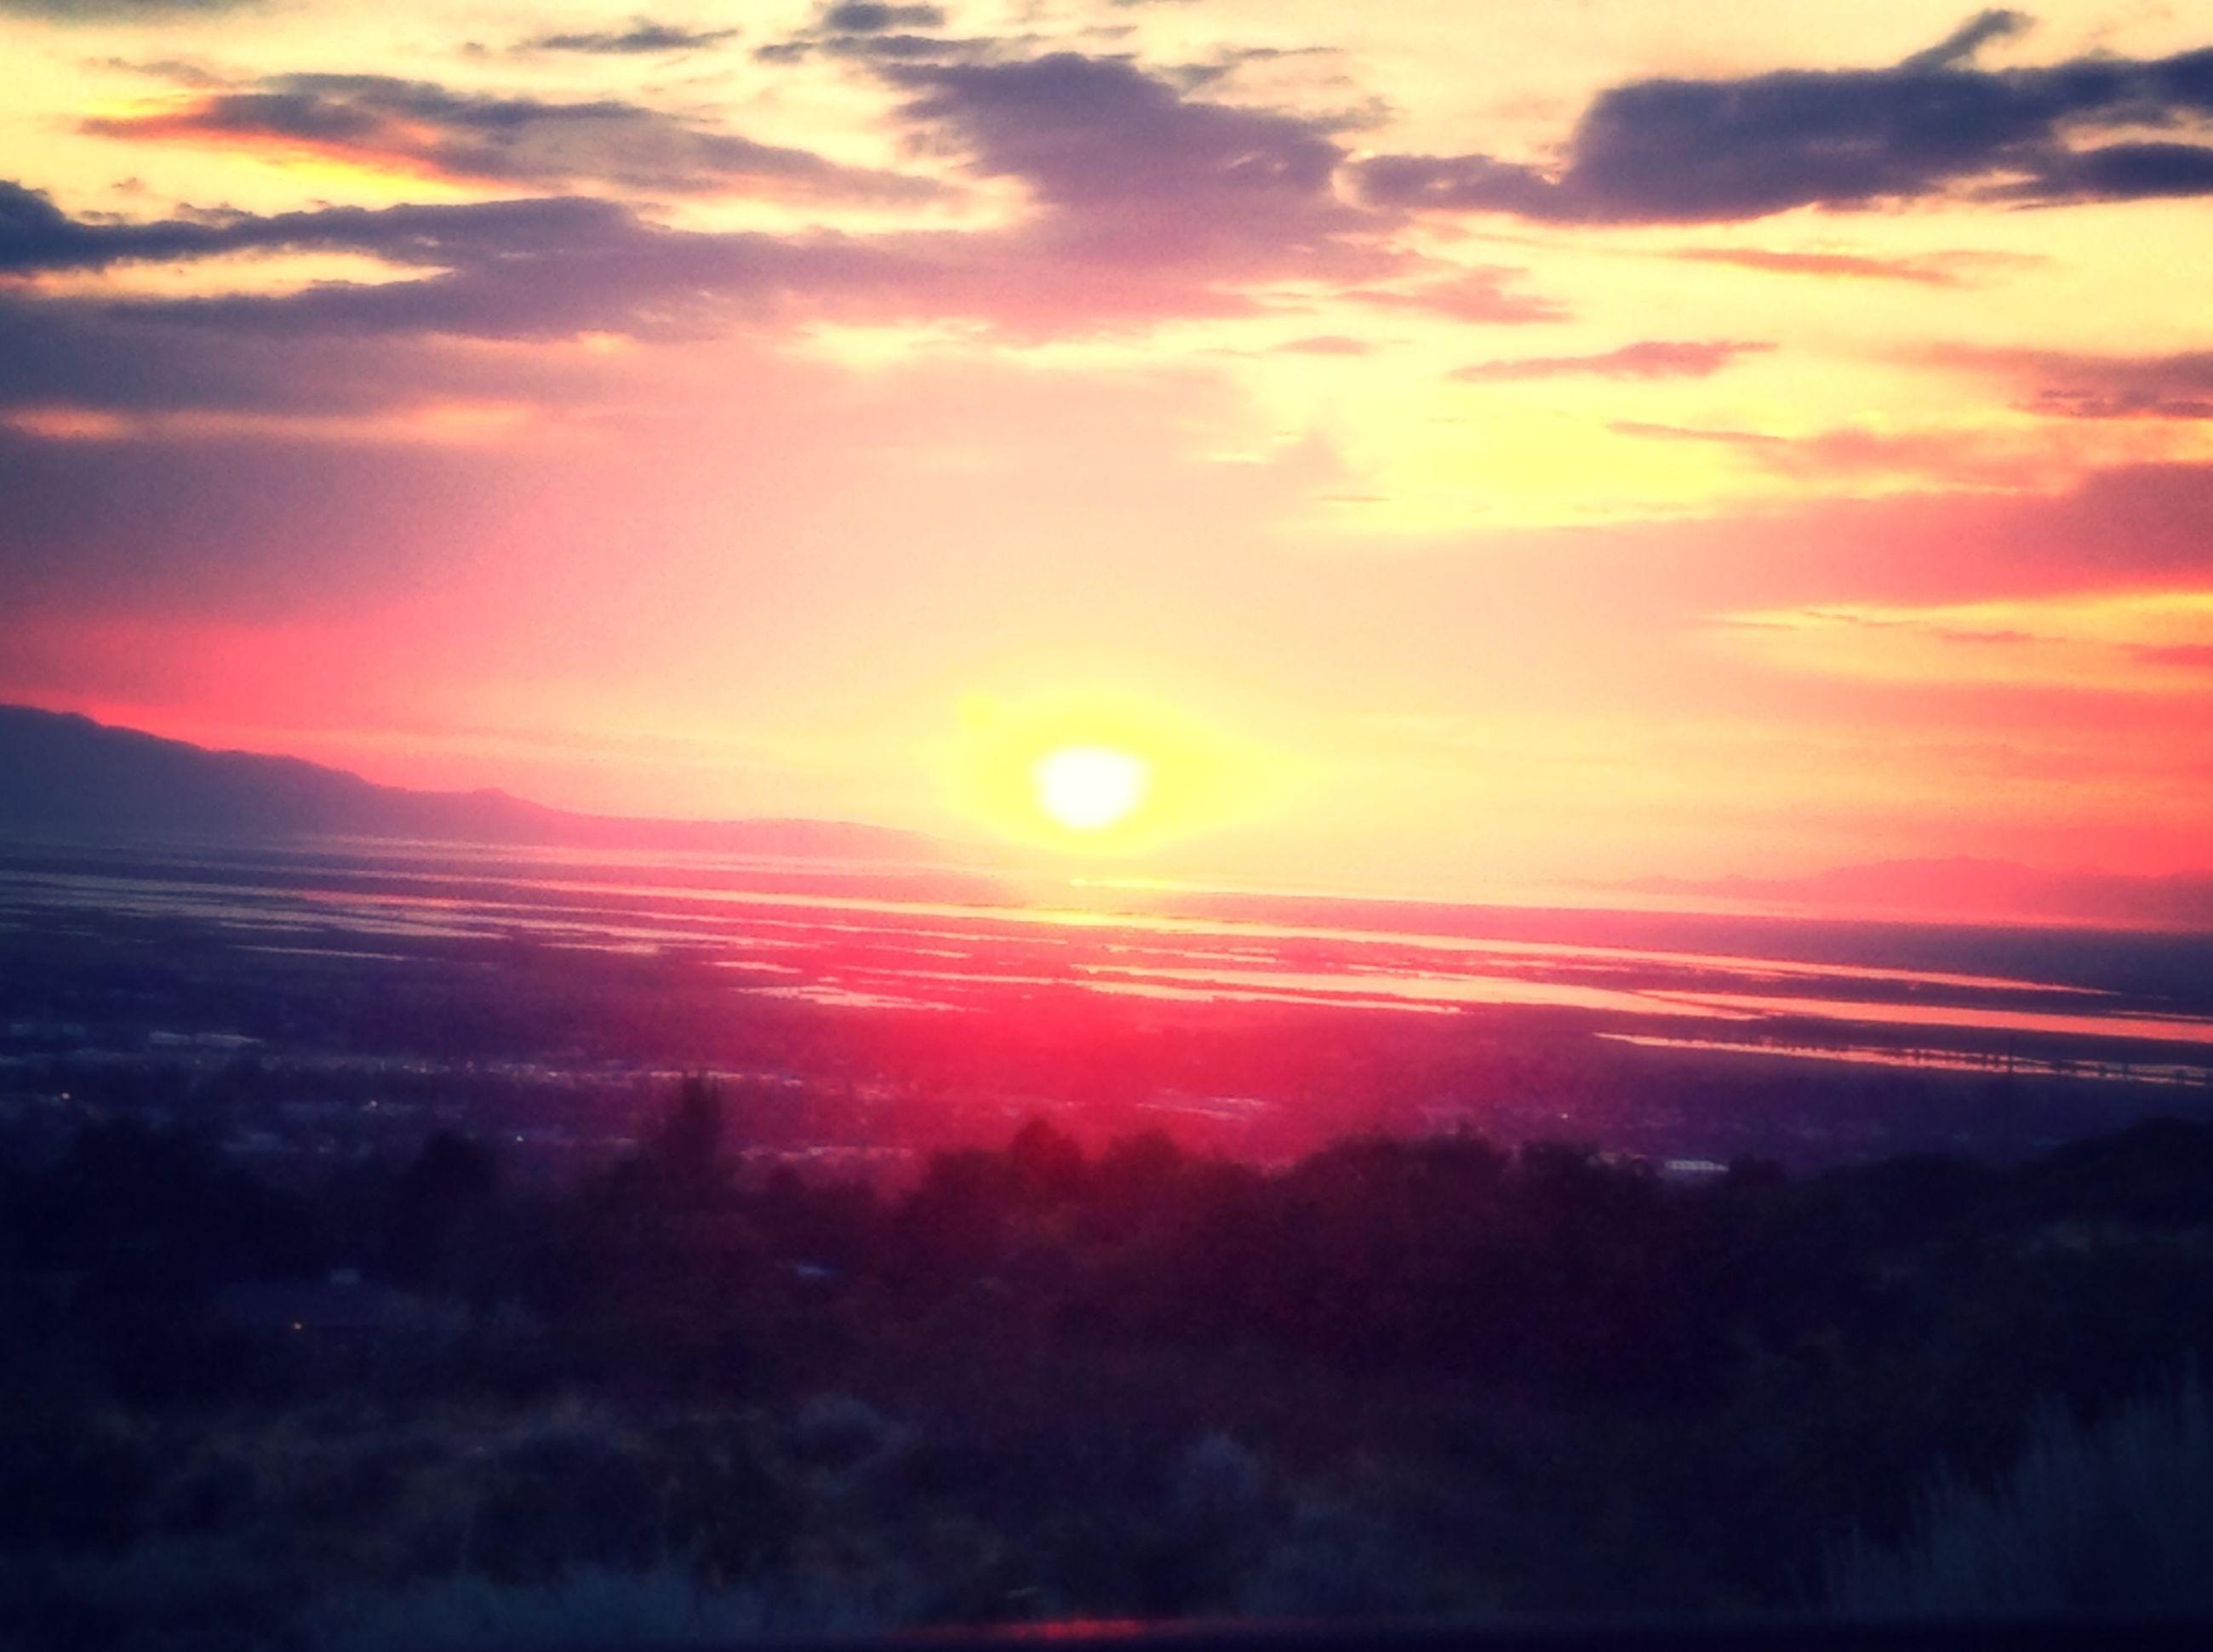 sunset, orange color, scenics, beauty in nature, tranquil scene, sky, tranquility, idyllic, nature, cloud - sky, silhouette, tree, dramatic sky, landscape, sun, outdoors, majestic, no people, cloud, non-urban scene